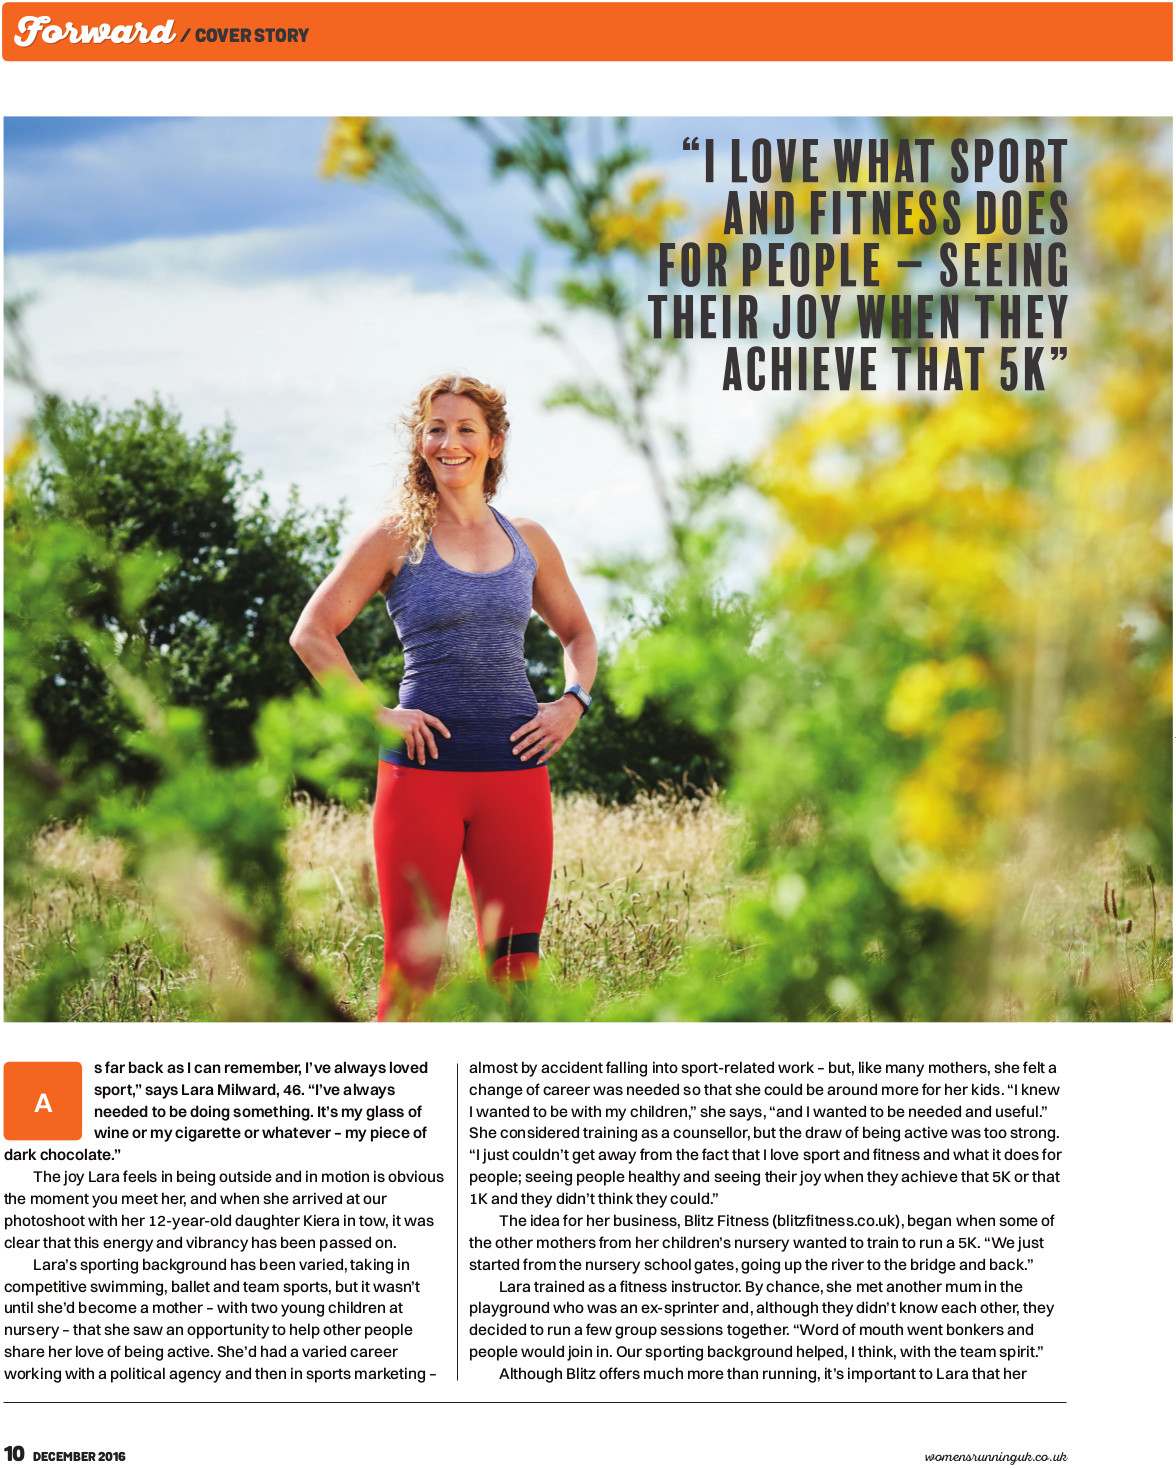 Women's Running Magazine - Article Page 1